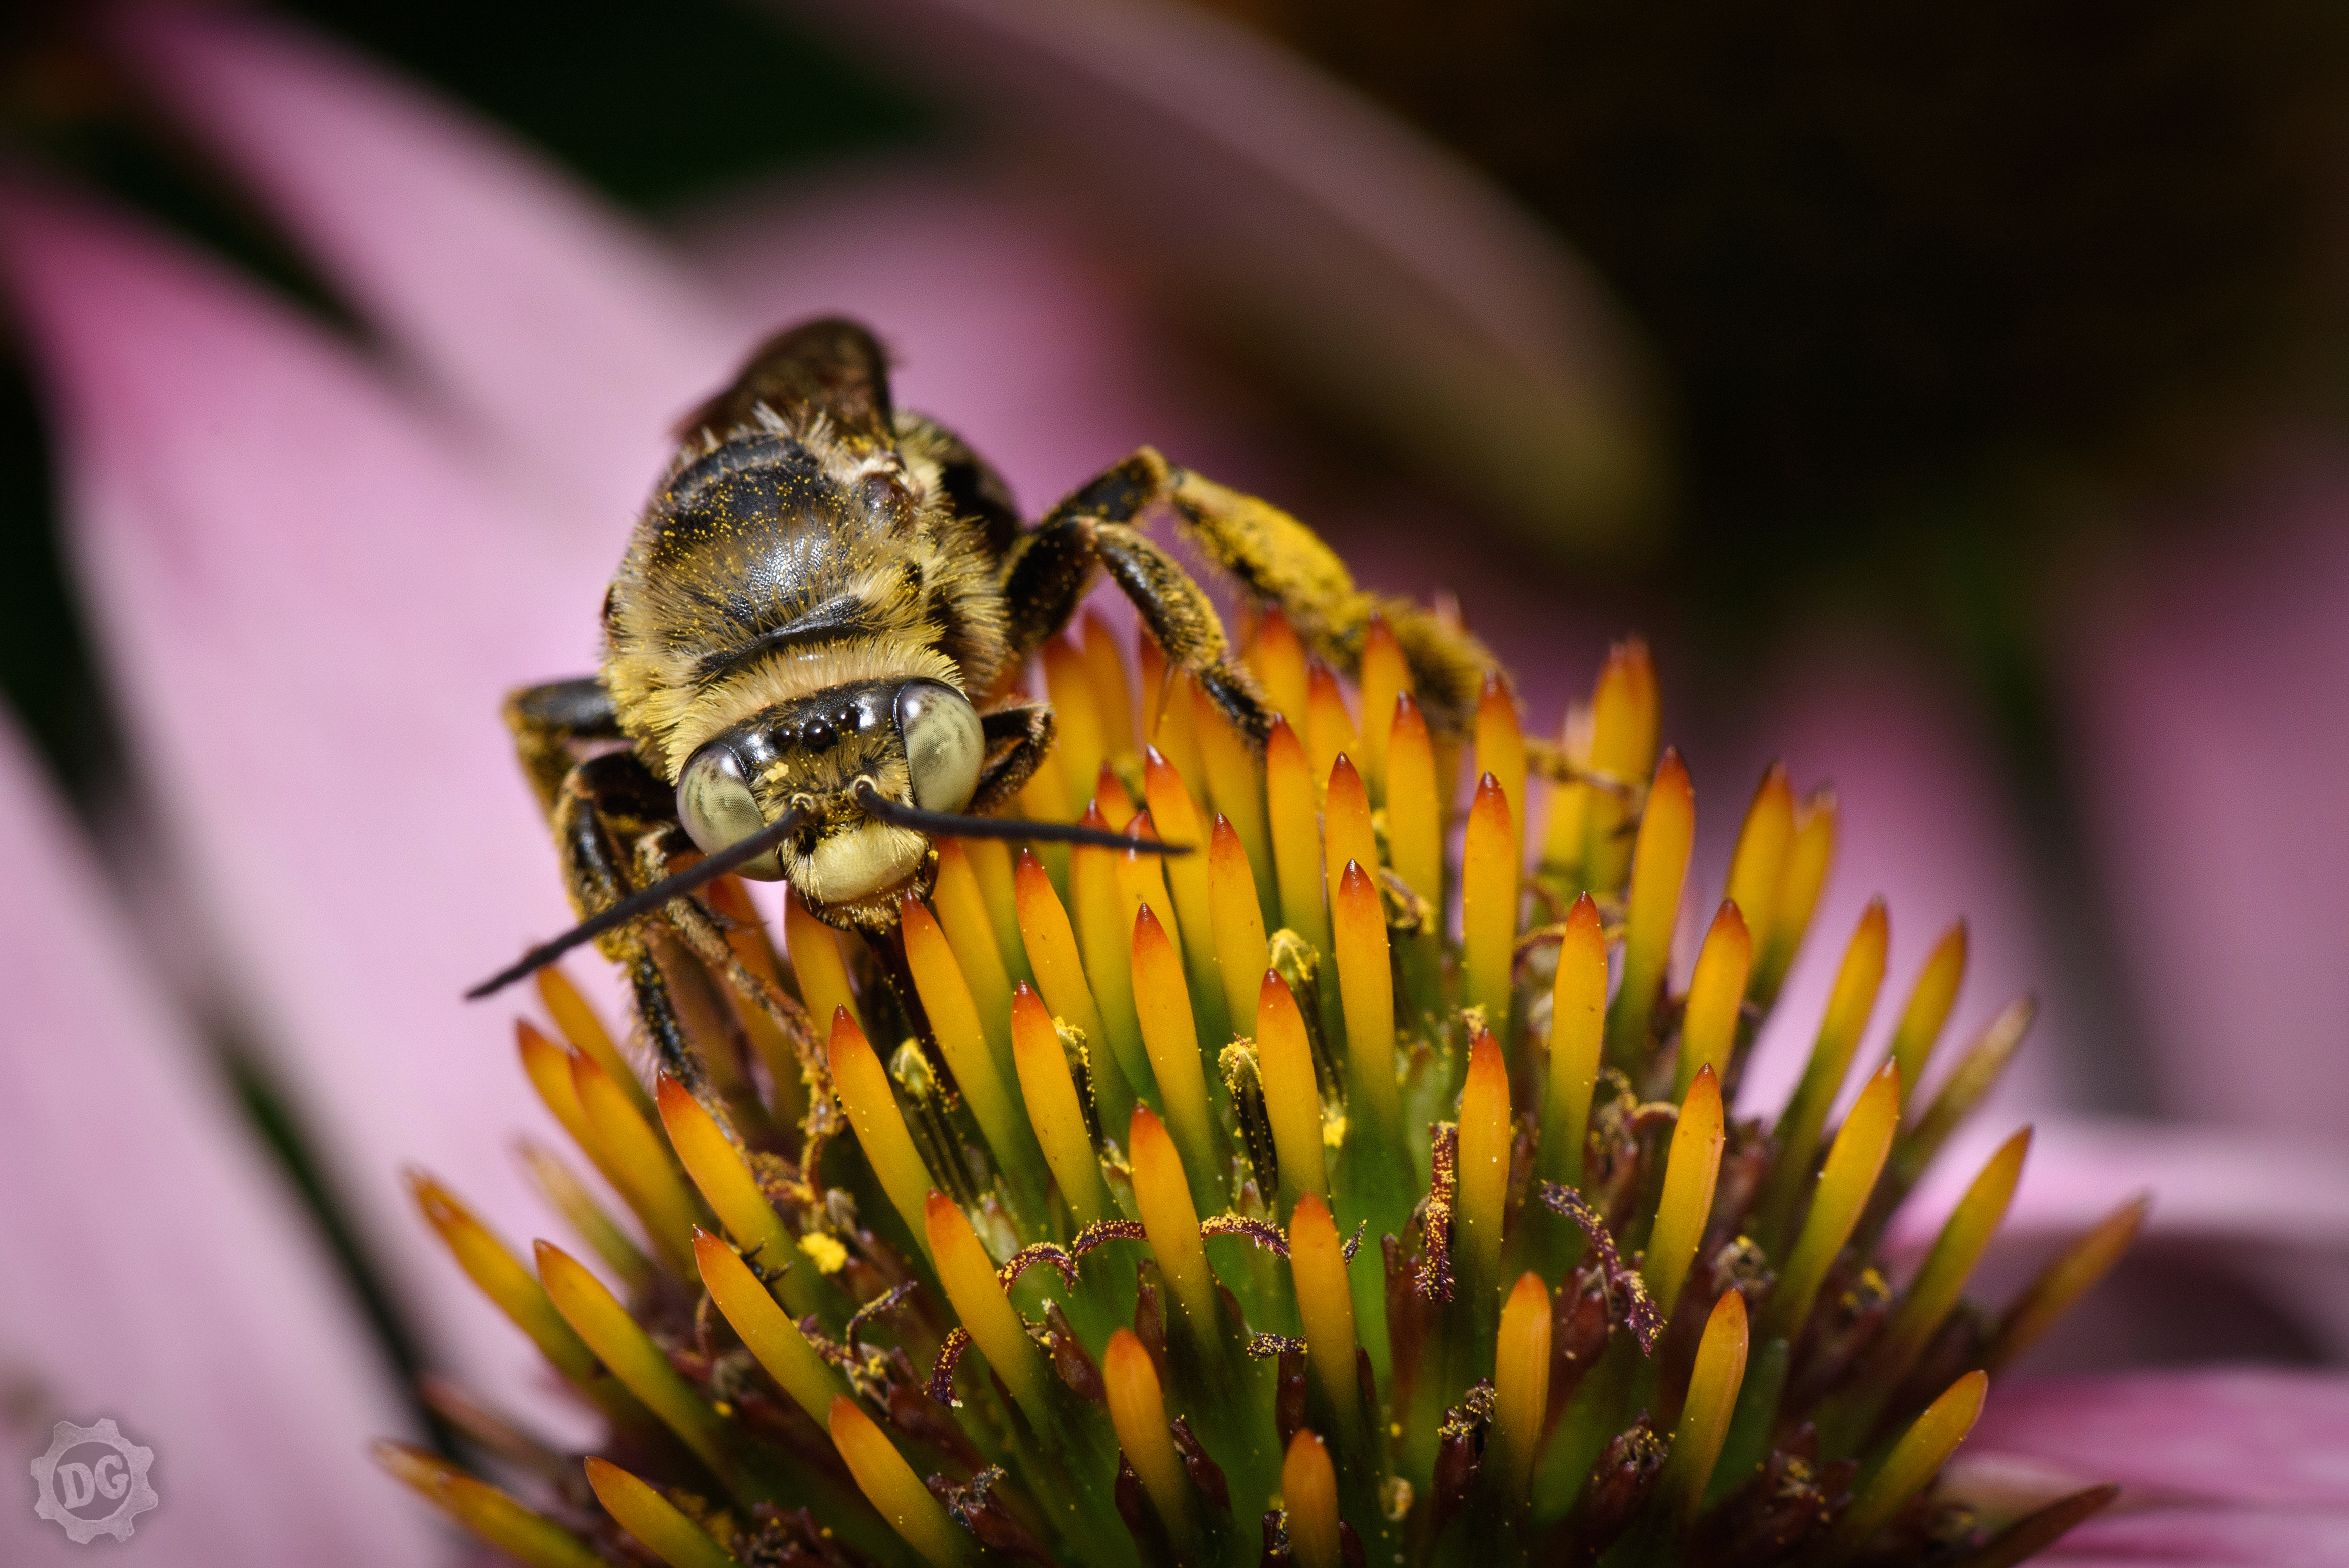 backyard bugs daniel gray charlotte product photographer